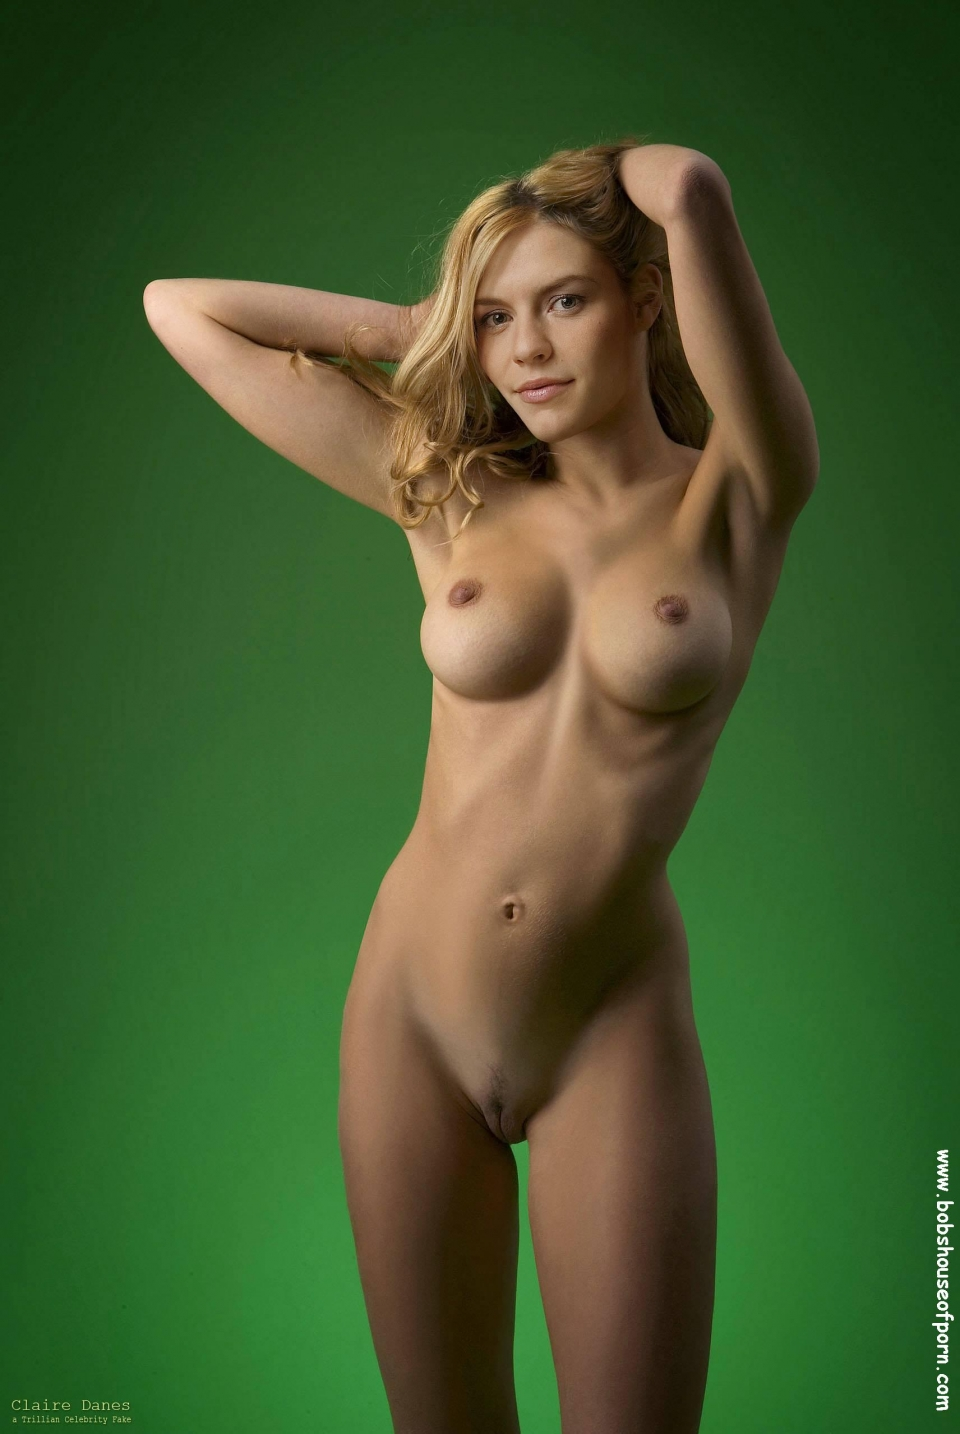 claire danes porn star